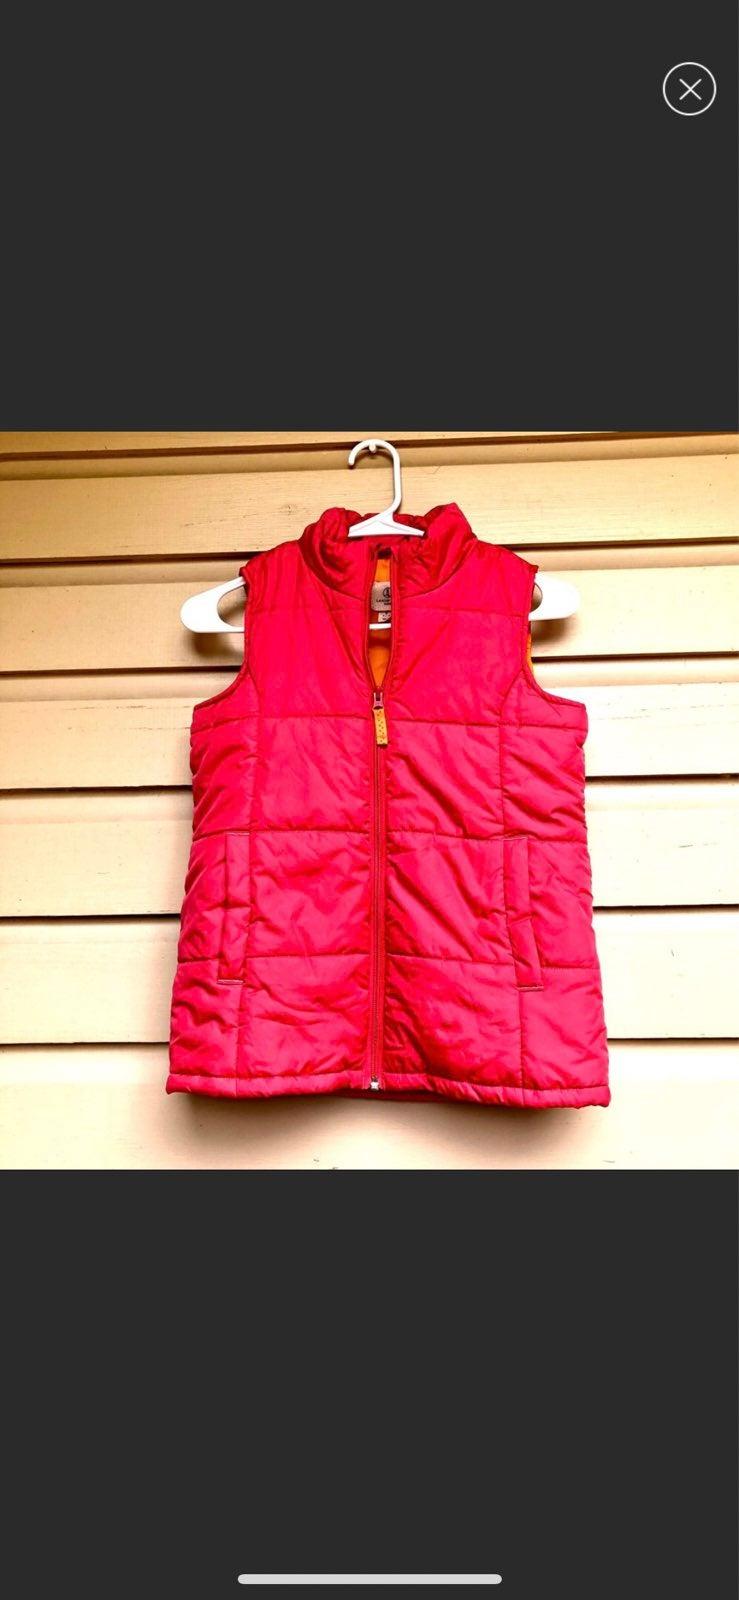 Land's End Girls Puffer Vest Pink Zip S